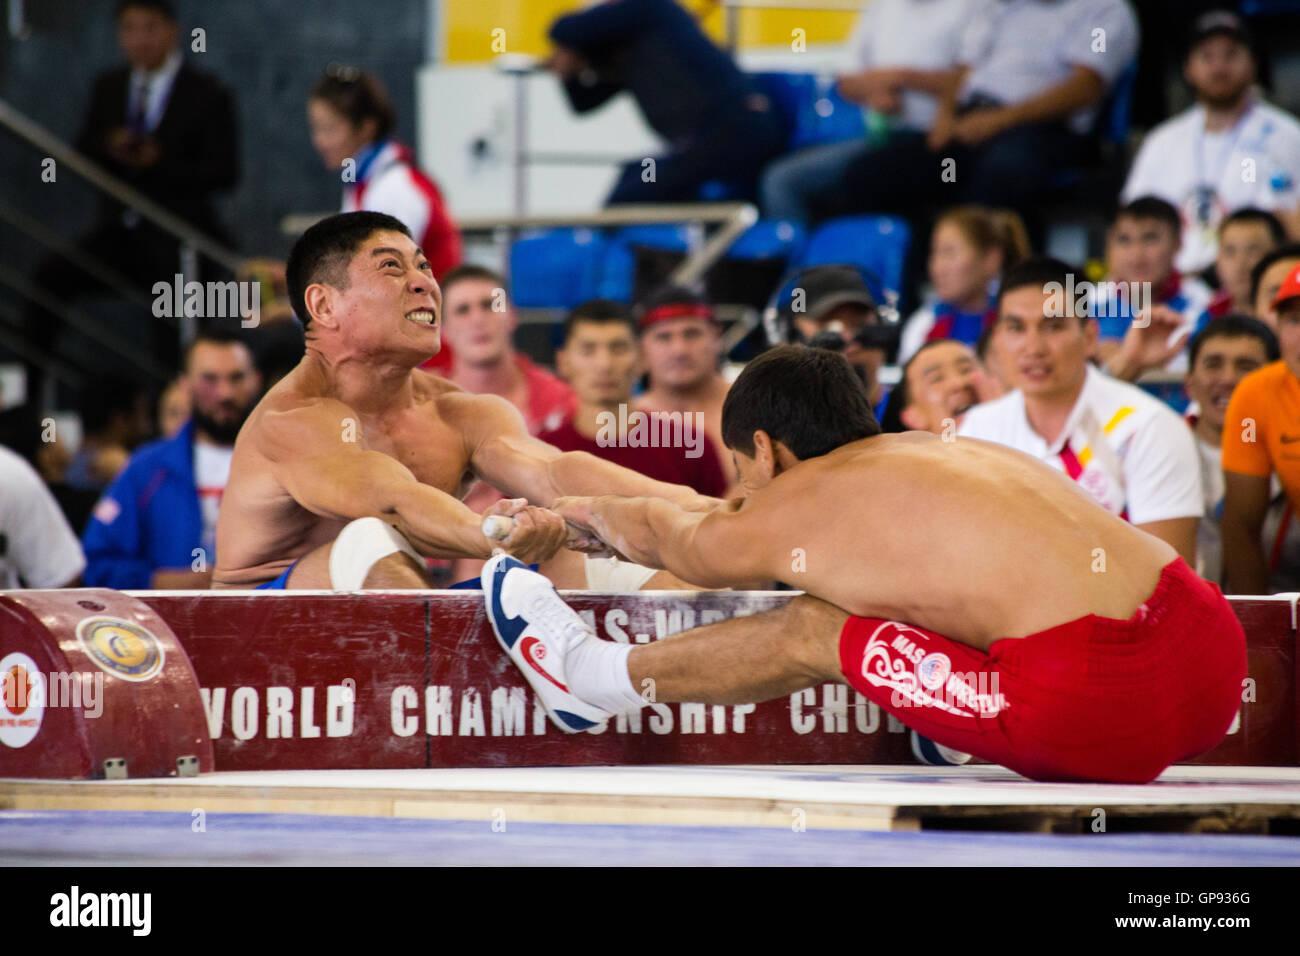 Atletas compiten en Mas-Wrestling (Мас-рестлинг) en el año 2016 Mundo nómada juegos en Kirguistán. Crédito: Stephen Lioy/Alamy Live News Foto de stock